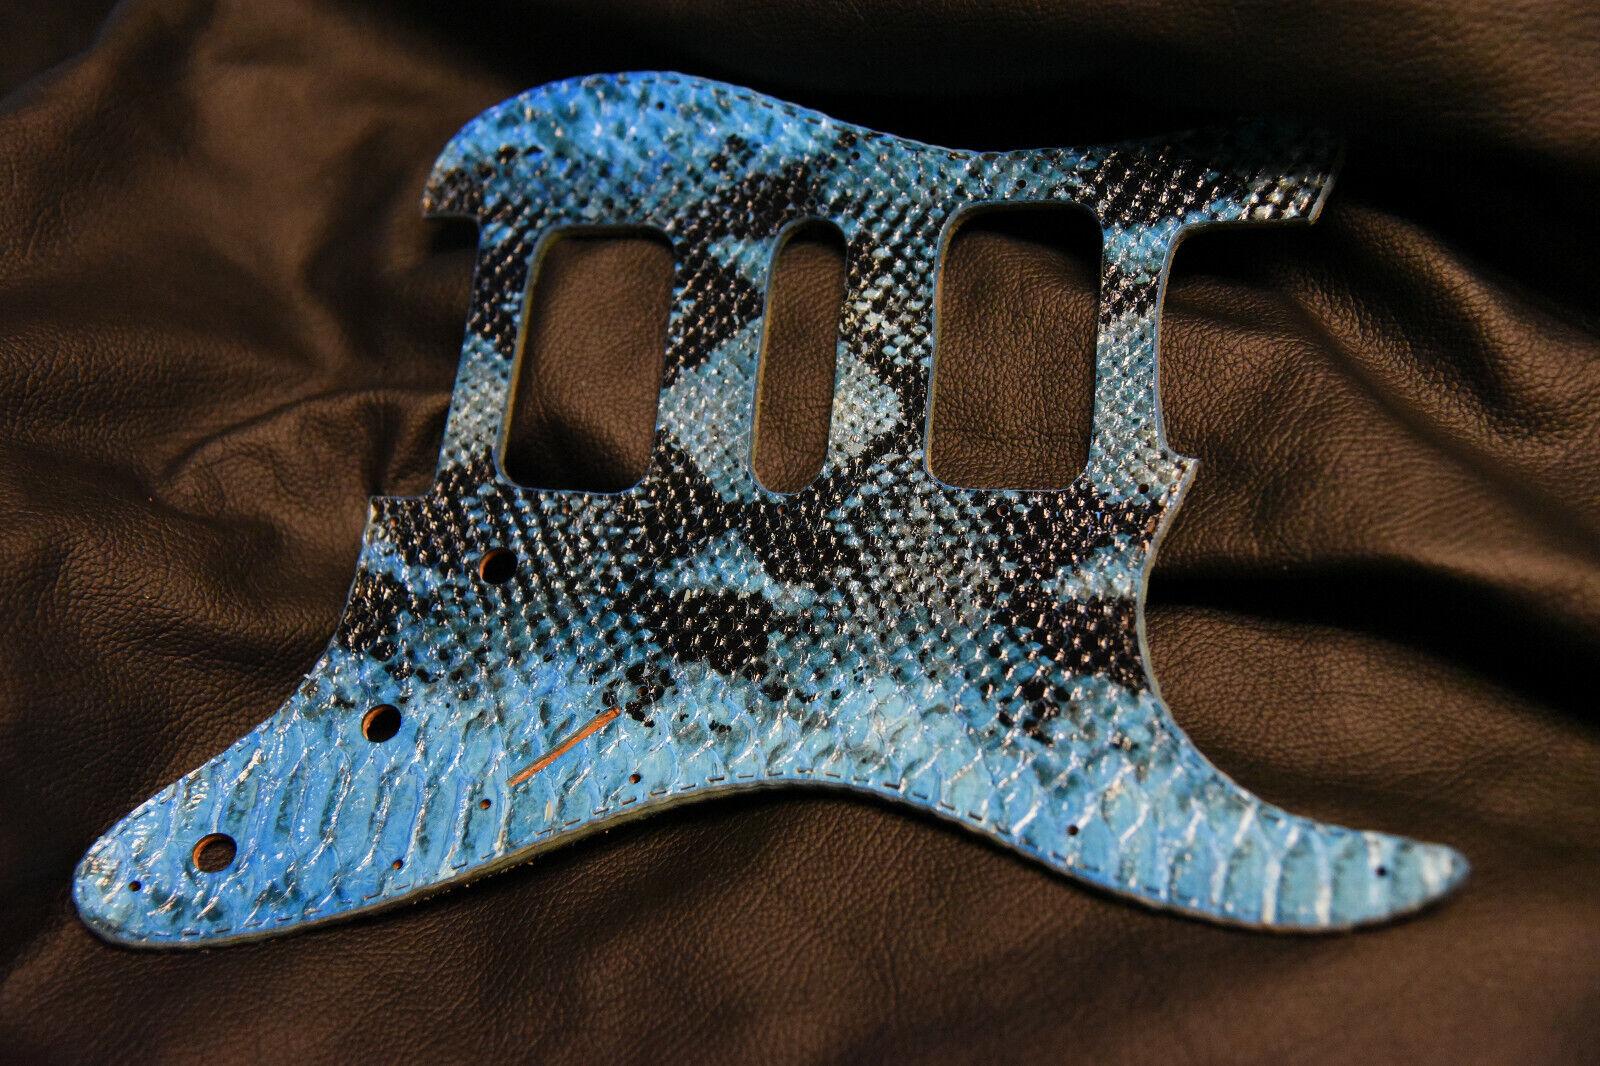 Fender Strat HSH pickguard leather tuscon python Snake skin turq and schwarz